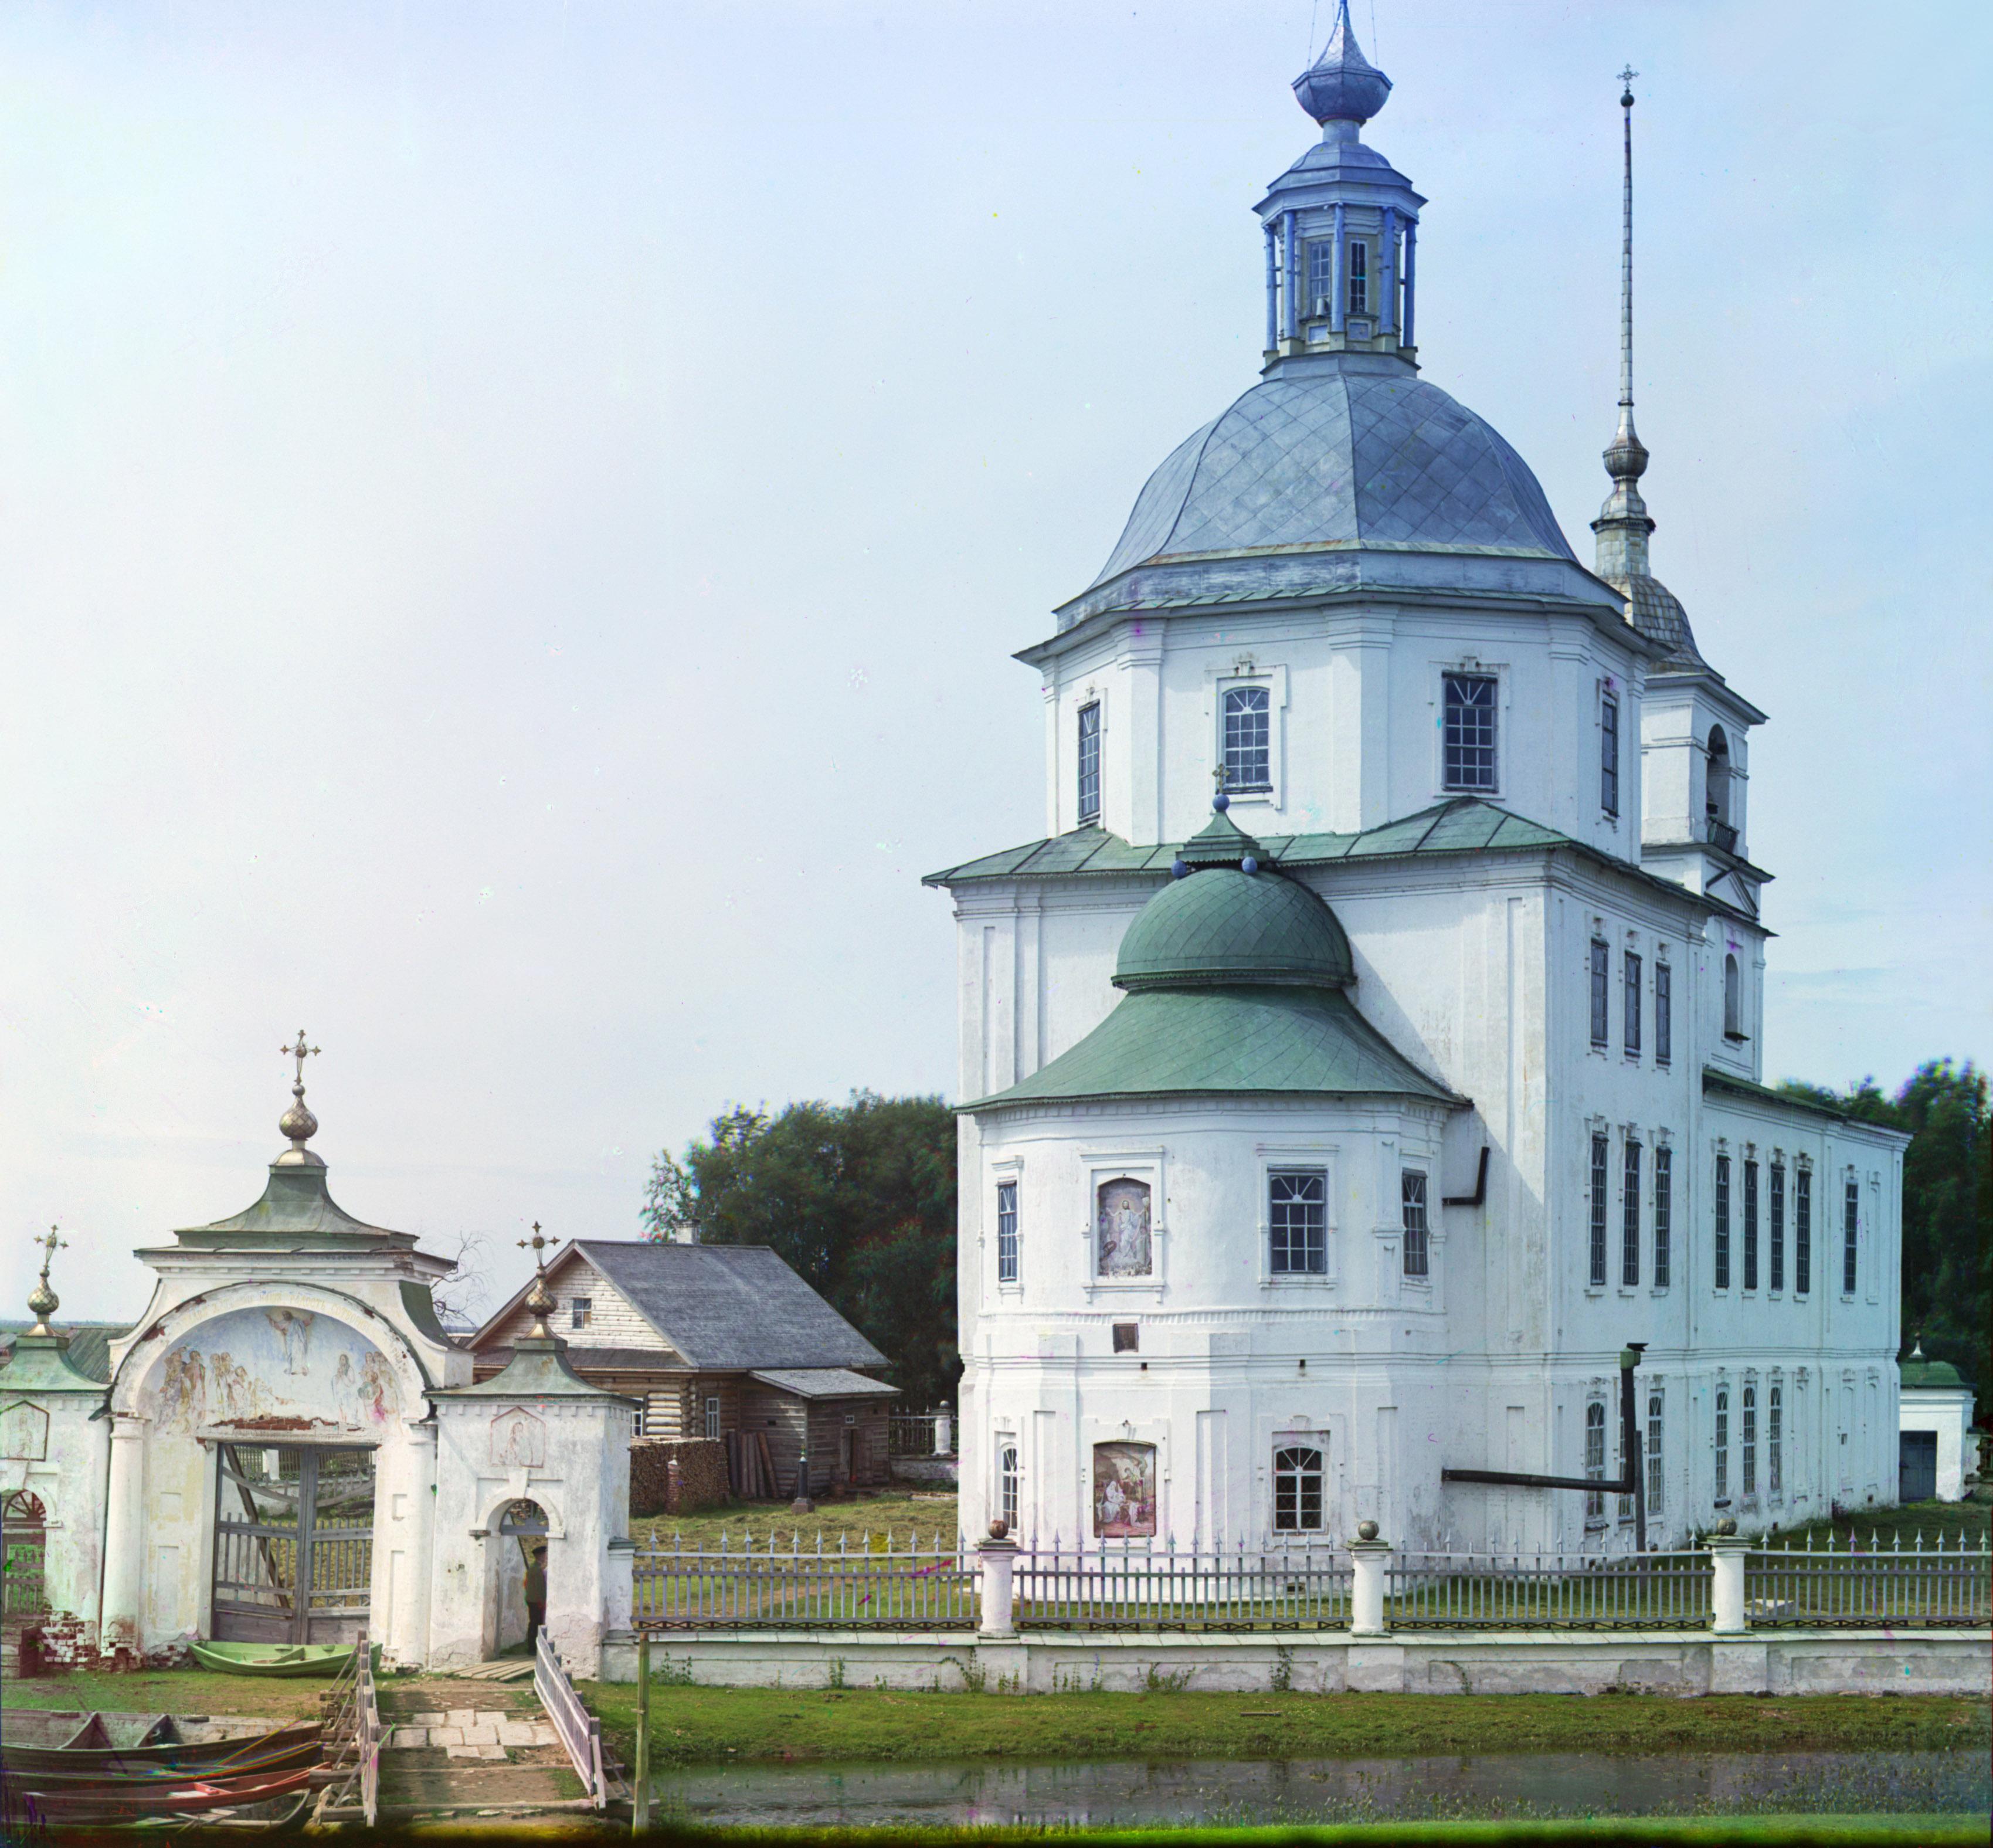 Посад Крохино. Церковь во имя Рождества Христова